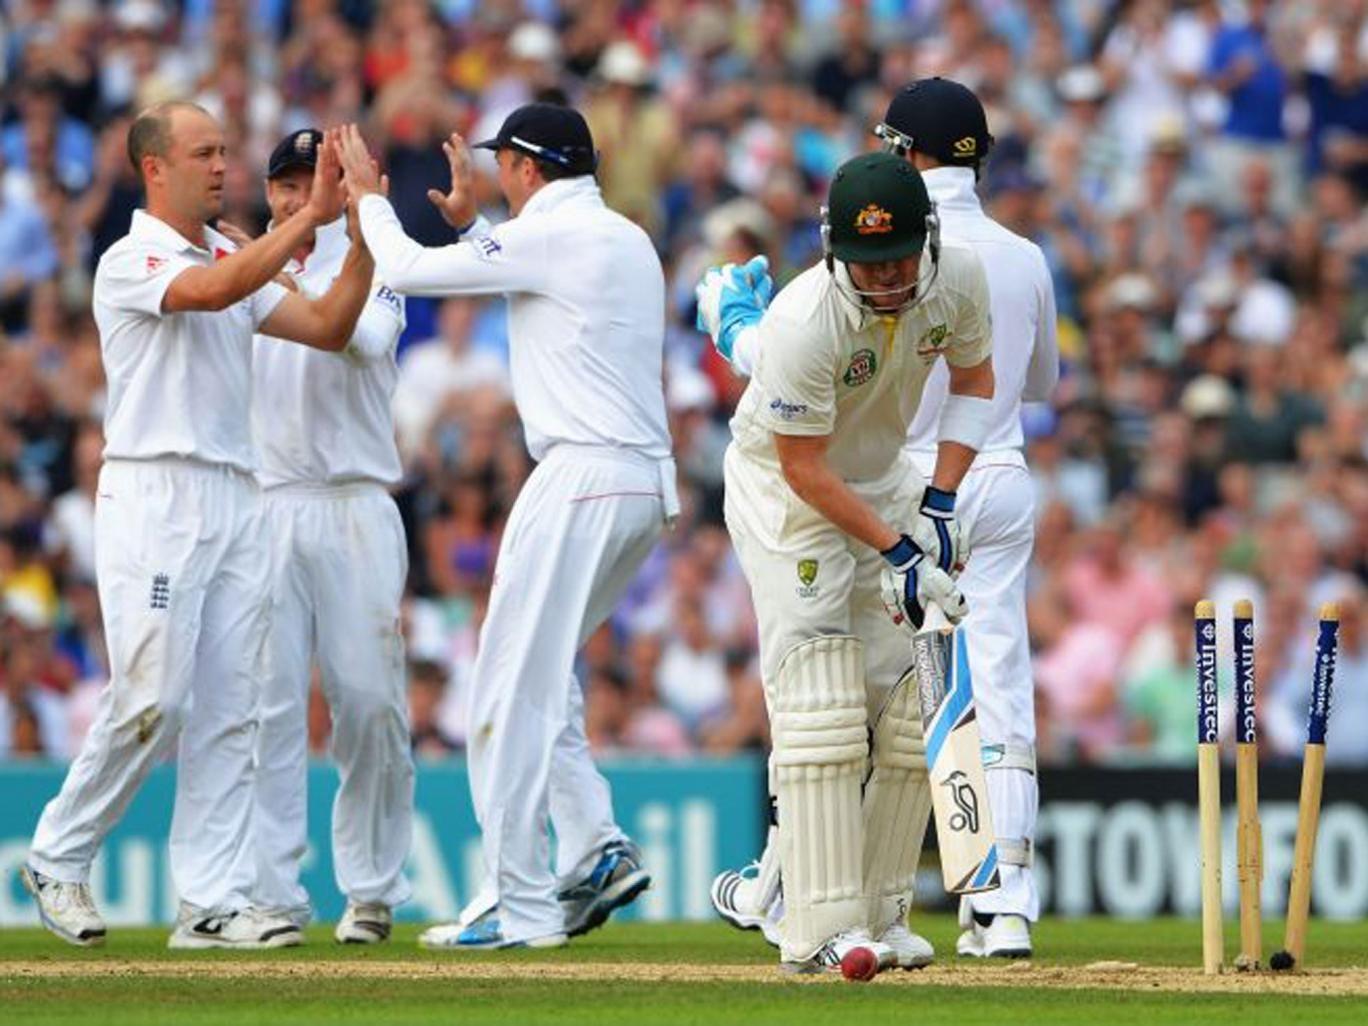 Jonathan Trott, far left, is congratulated after taking the wicket of Australia's Brad Haddin